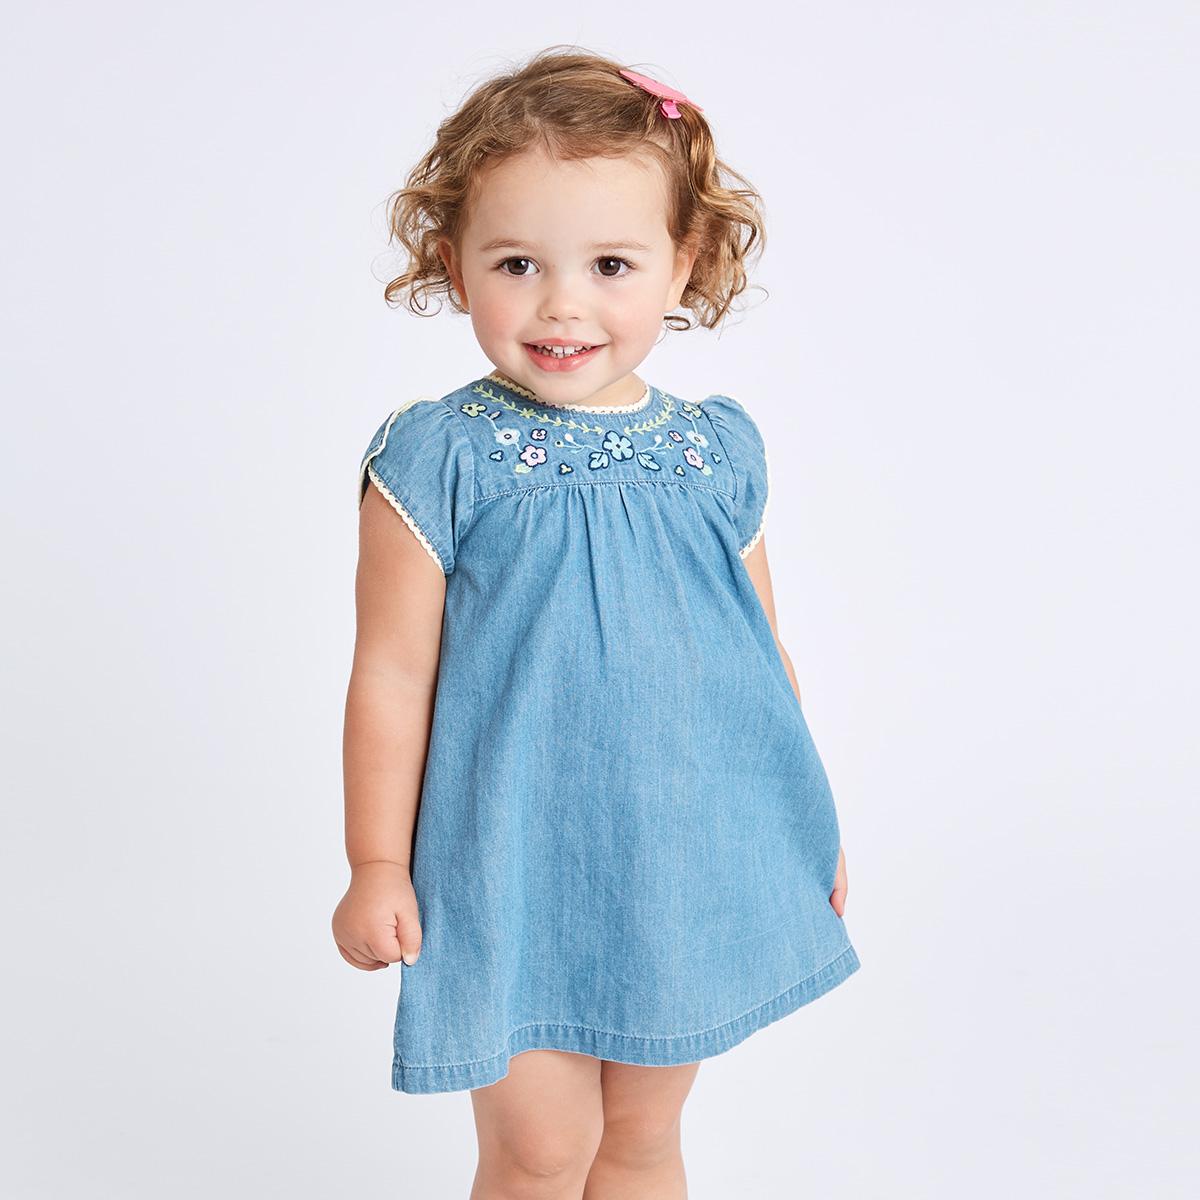 davebella戴维贝拉夏装新款女童牛仔连衣裙宝宝背心公主裙DB7032